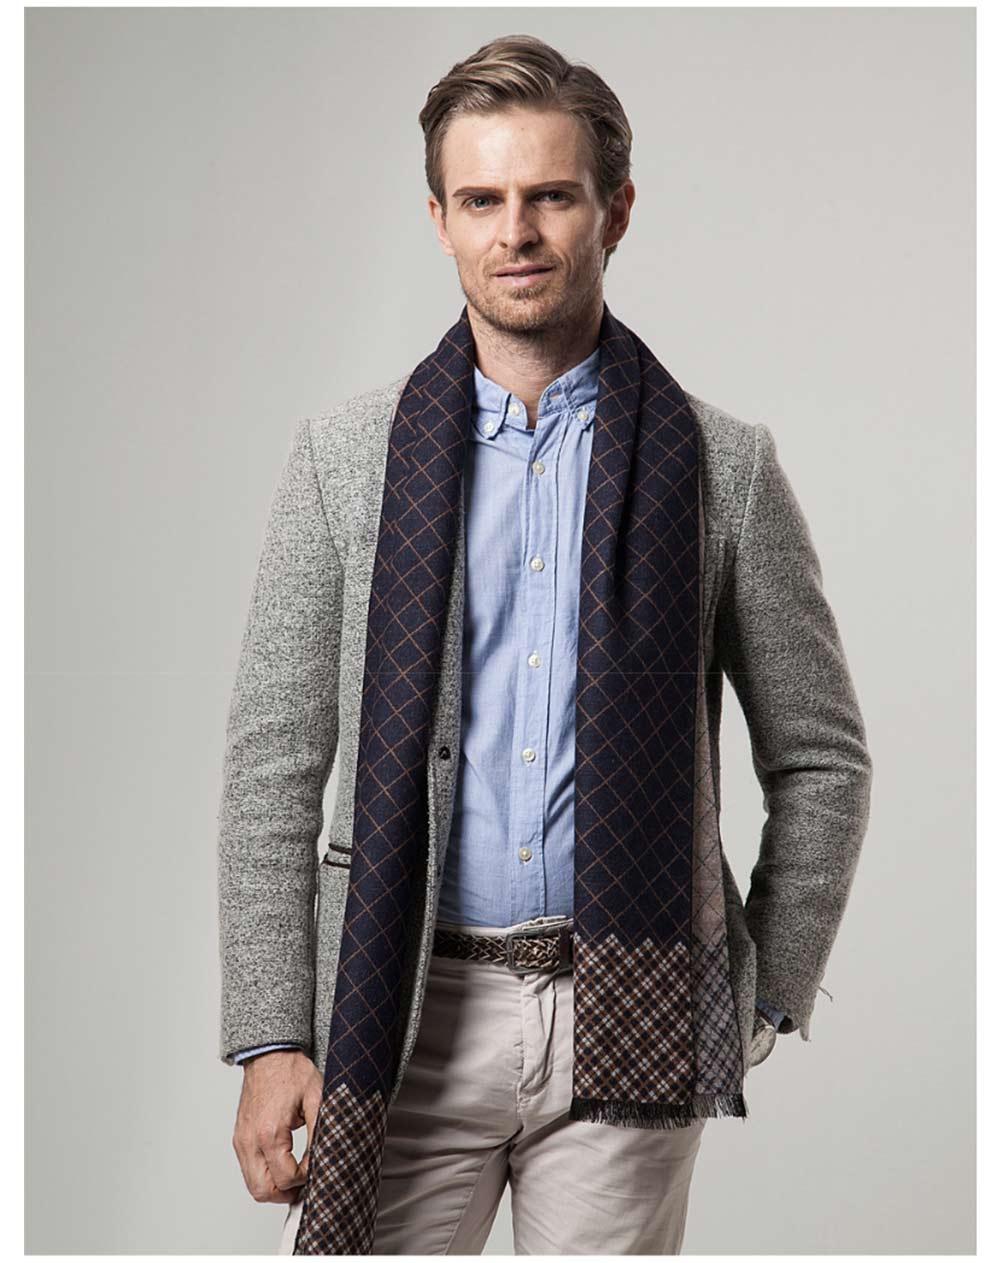 British Style Plaid Scarf for Men, Business Man, Gentleman, Unique Imitation Cashmere Plaid scarf, 2019 Brand New Men's Scarf 11